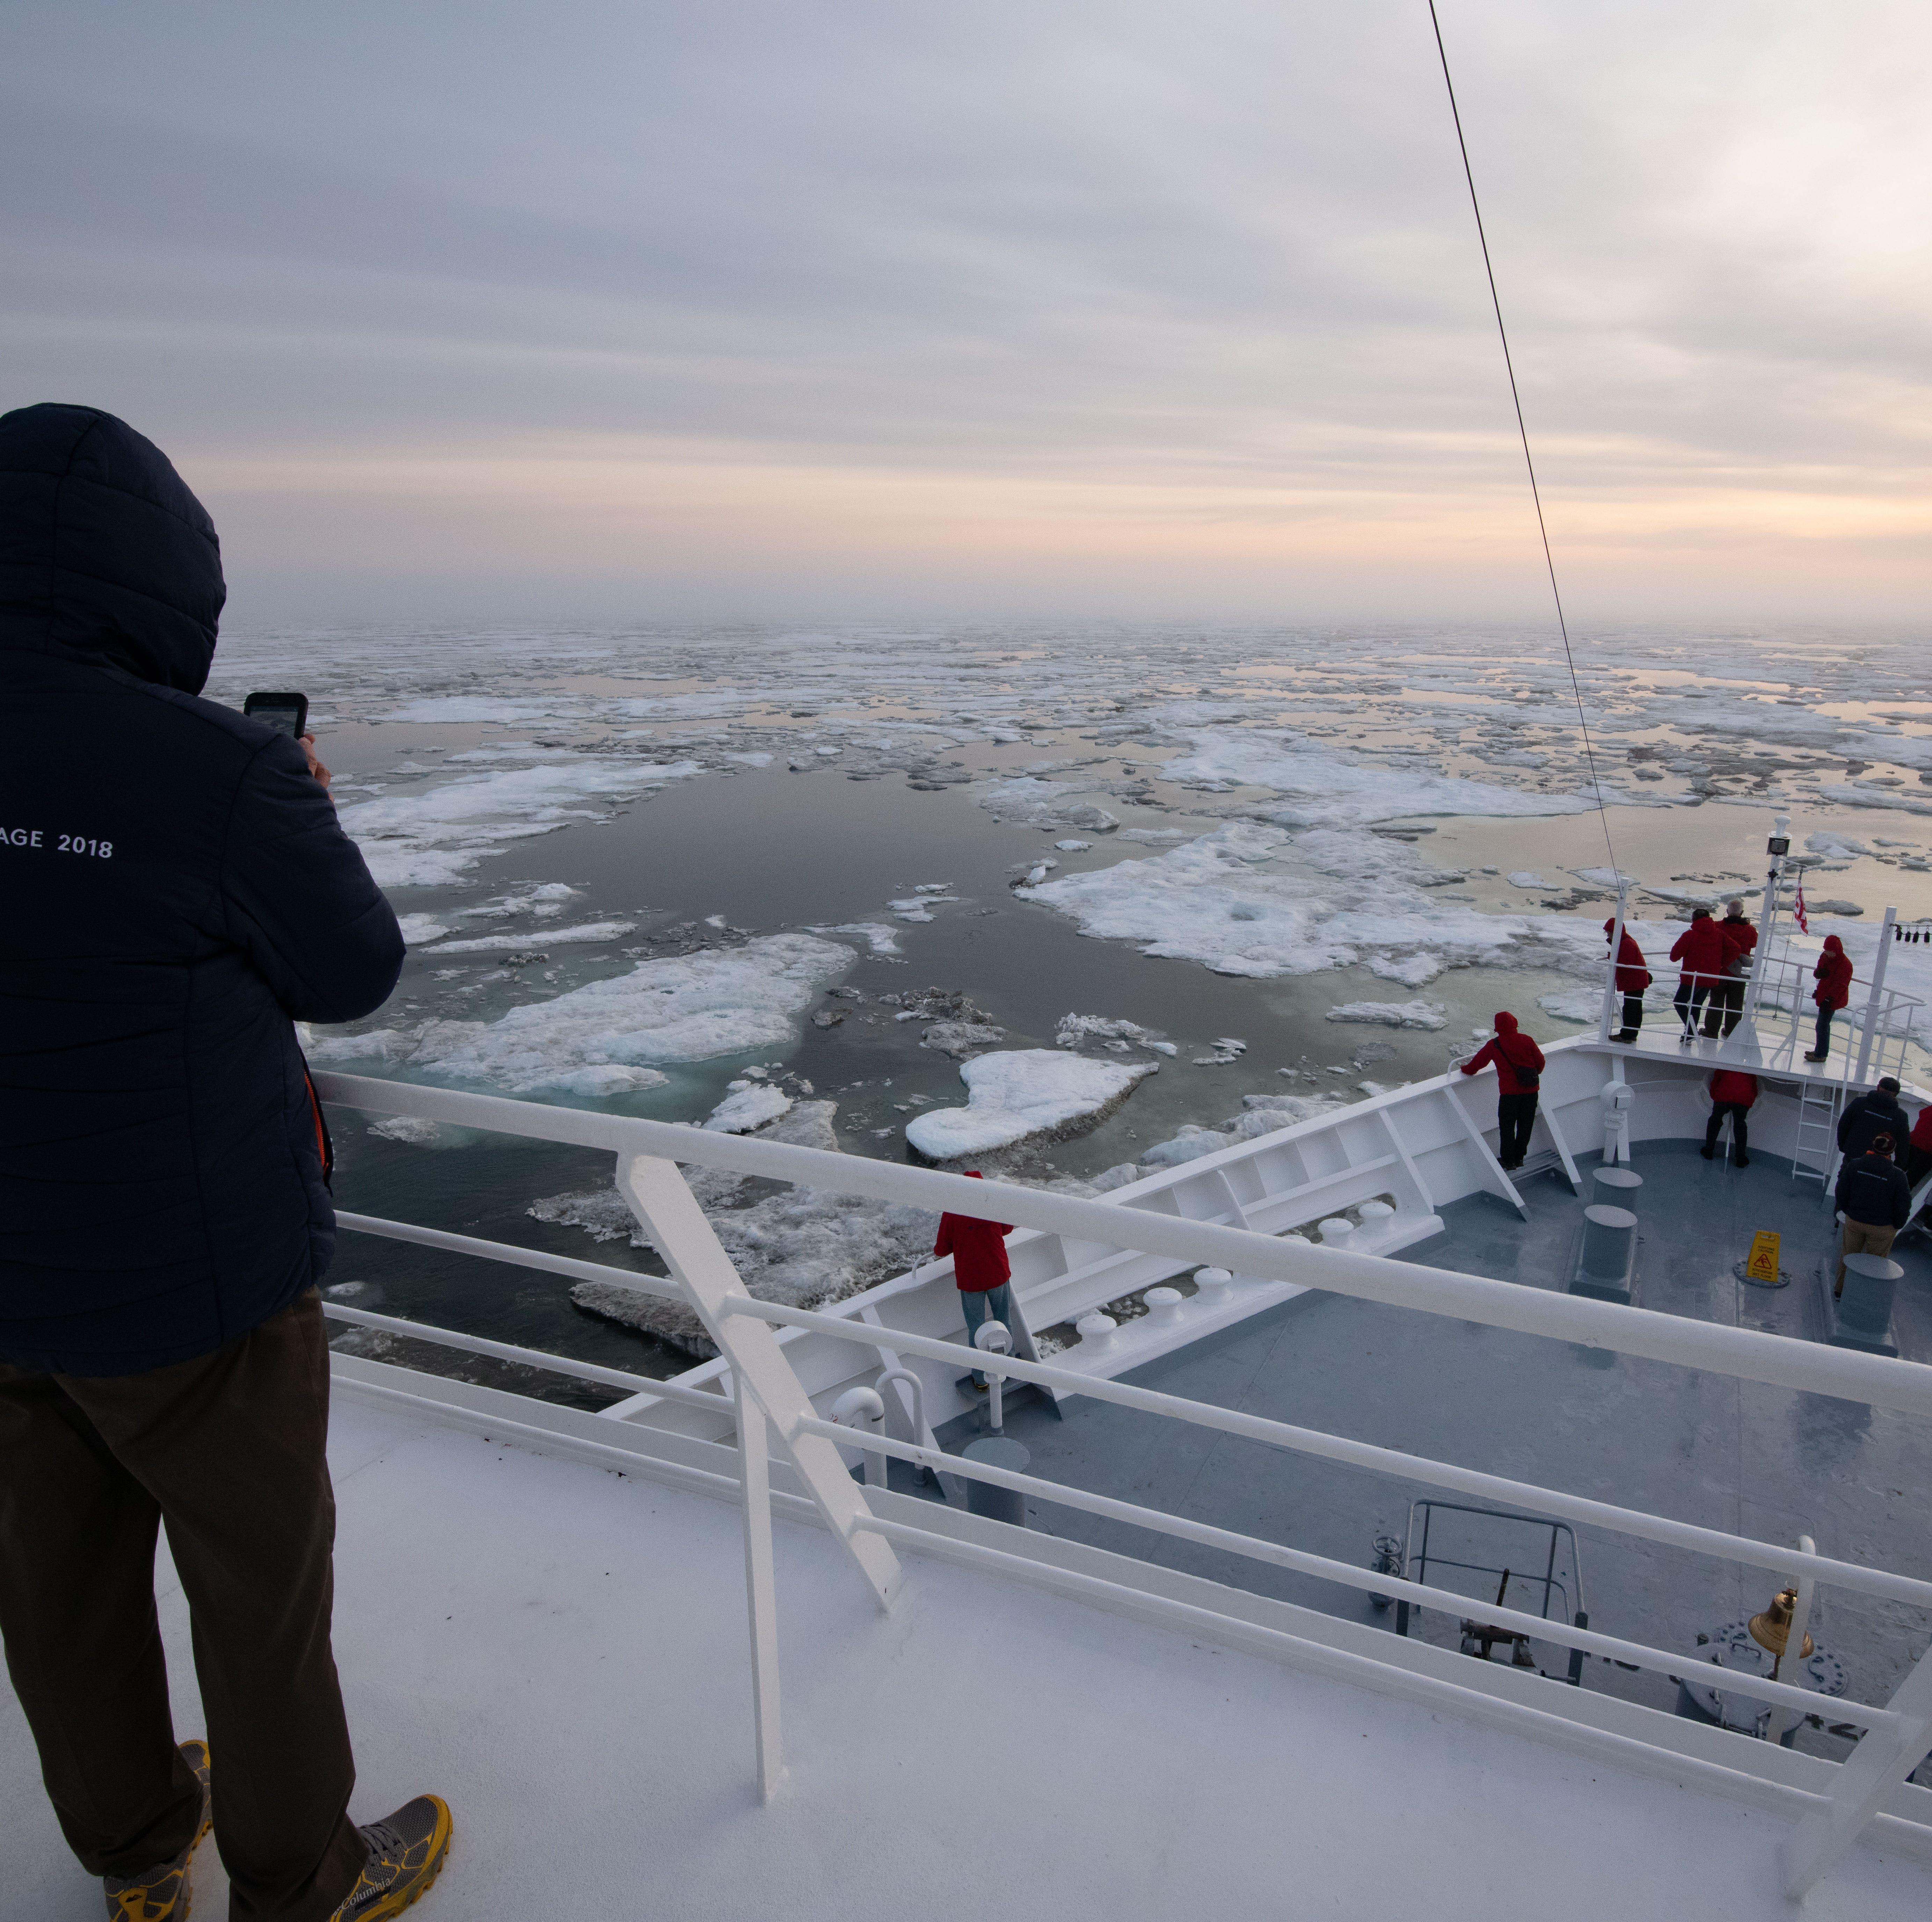 Polar bears, ice fields: New cruises across Russian Arctic bring rare adventure